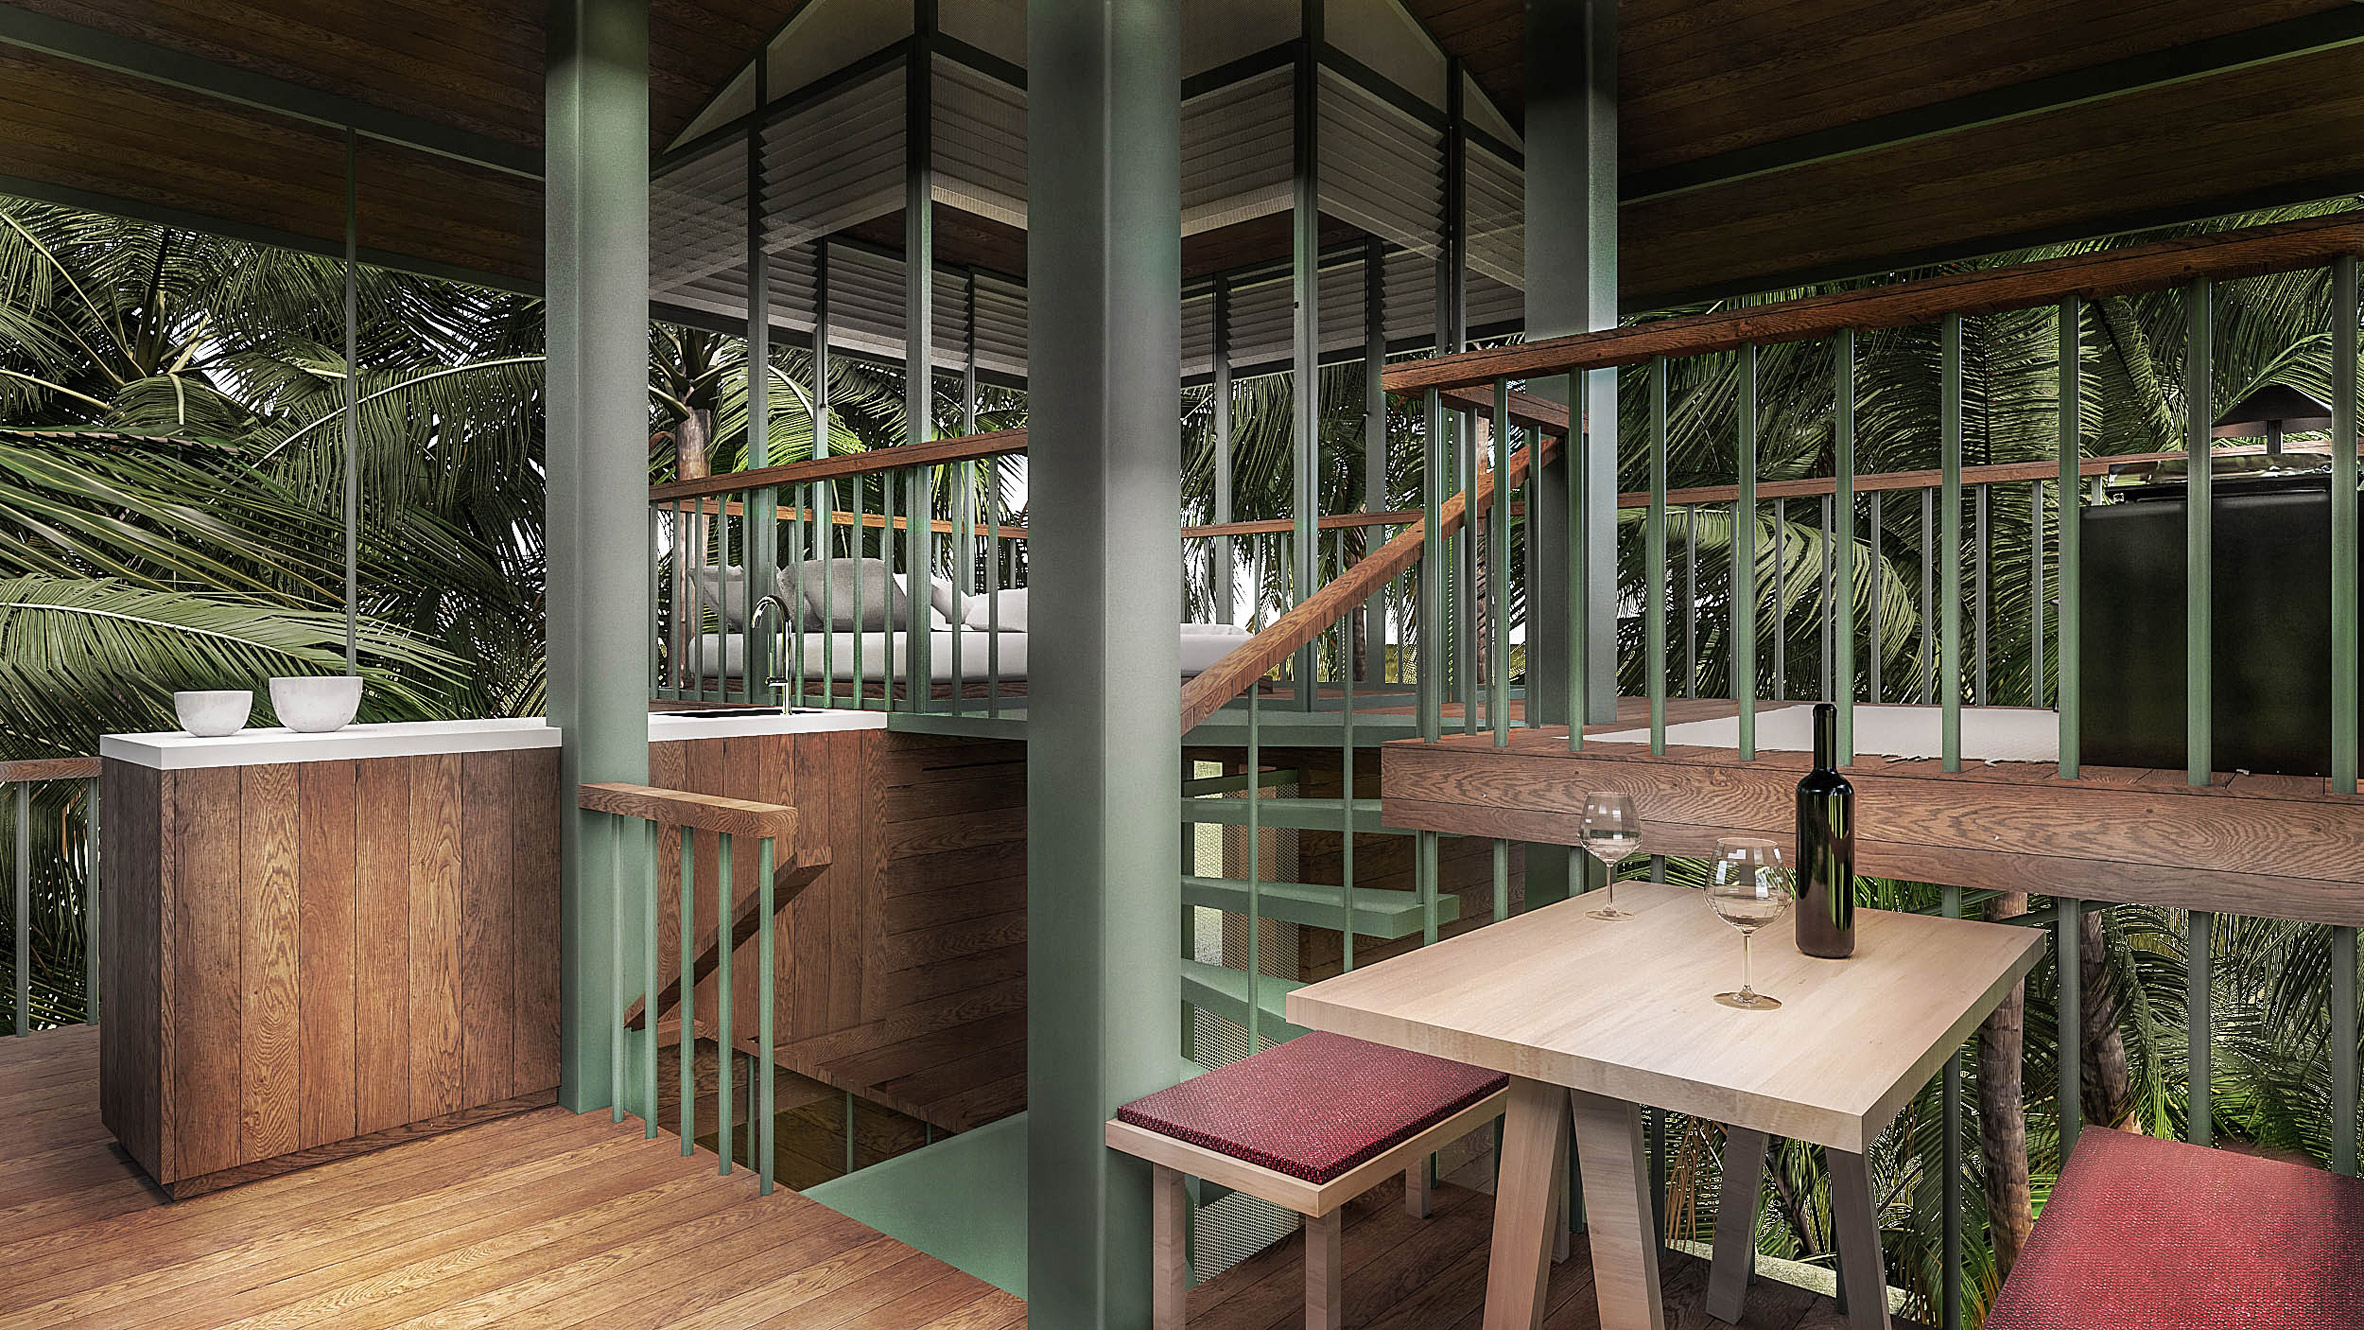 Stilt Studios by Alexis Dornier